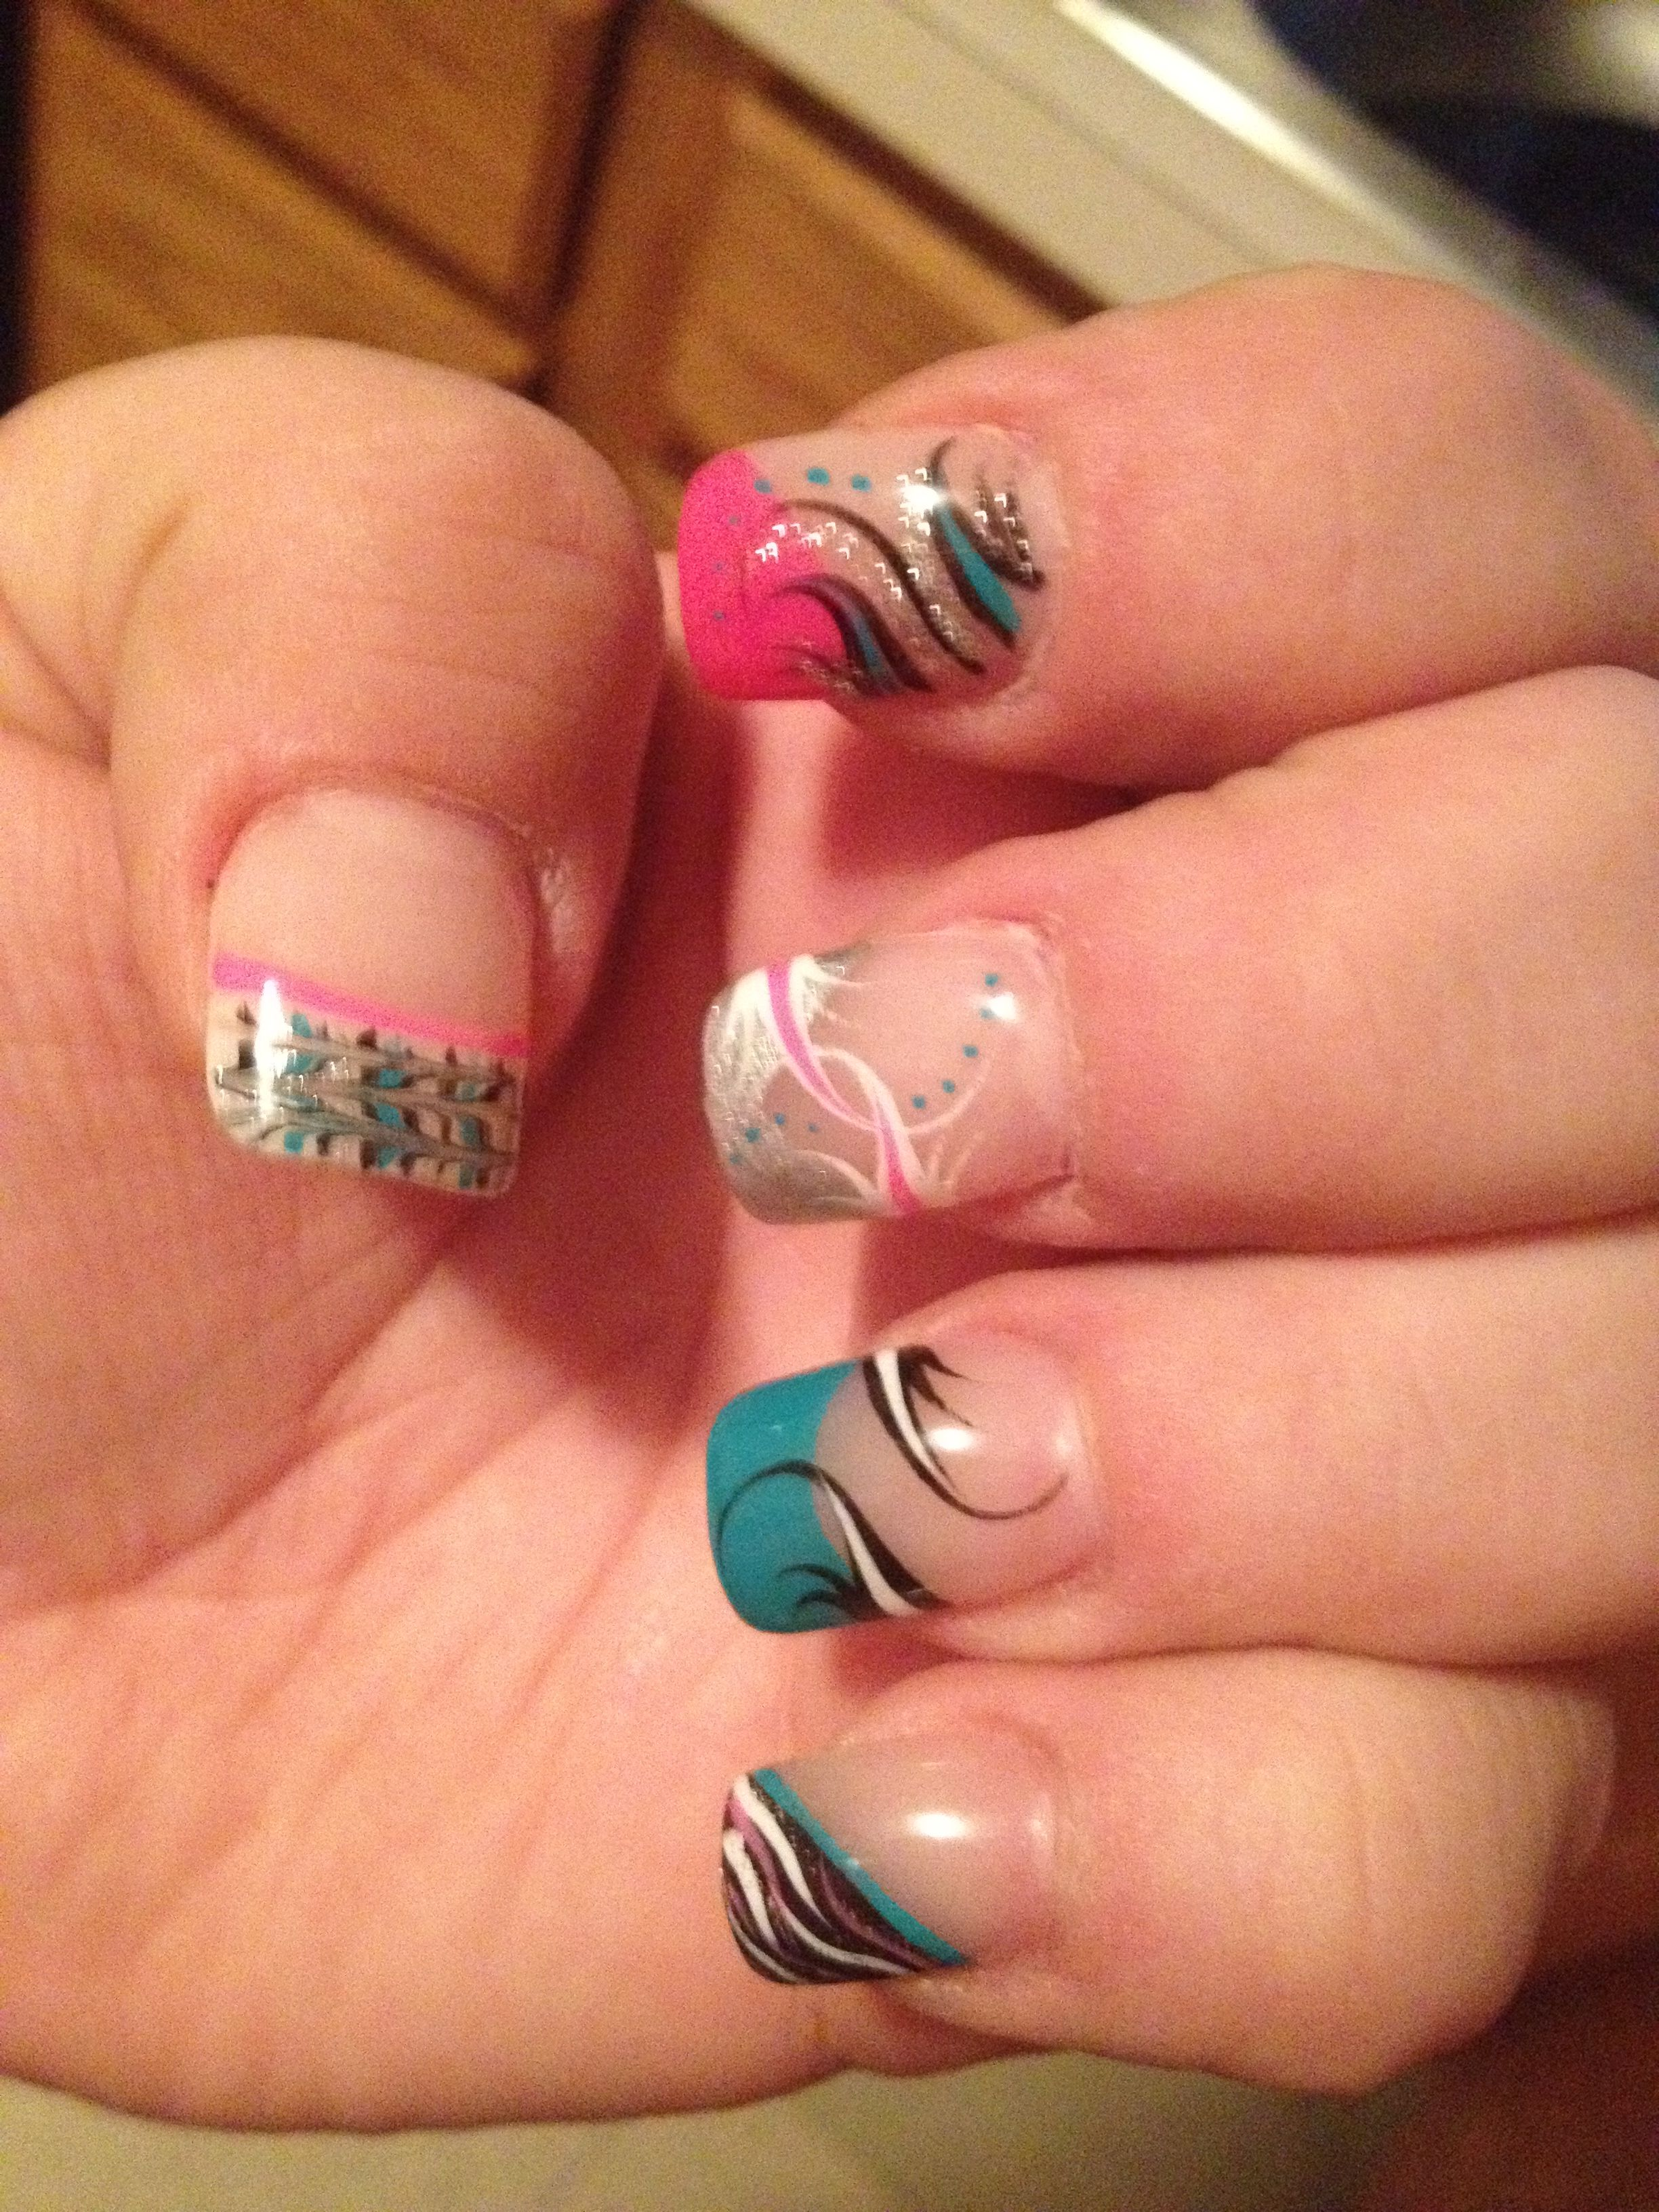 Crazy nails beauty pinterest crazy nails nail nail and diva nails - Diva nails and beauty ...